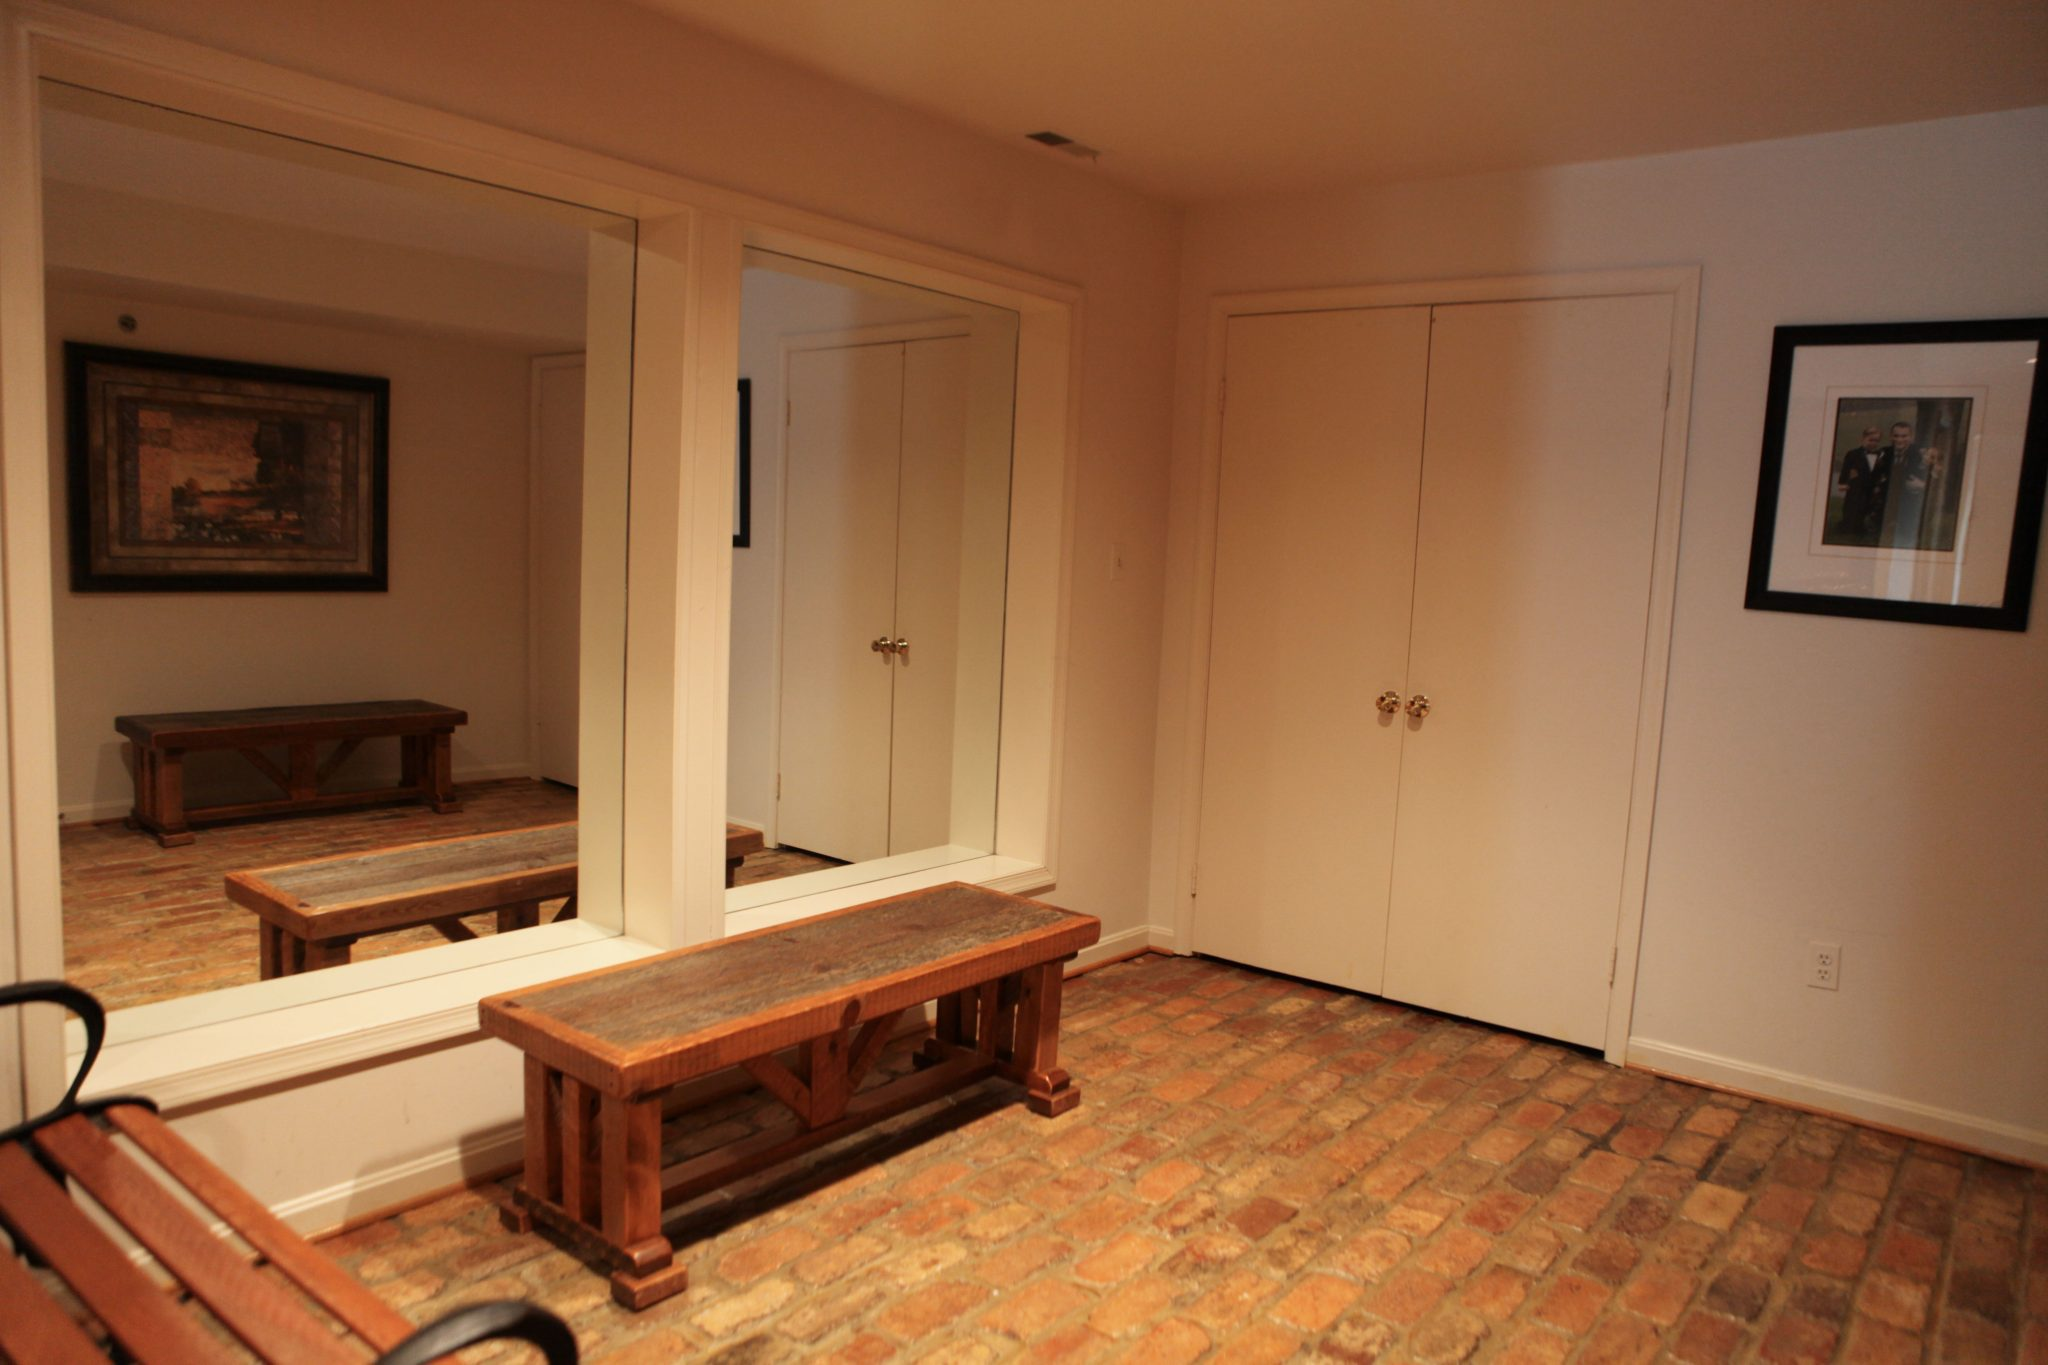 Groom's room at Morningside Inn wedding venue in Frederick Maryland